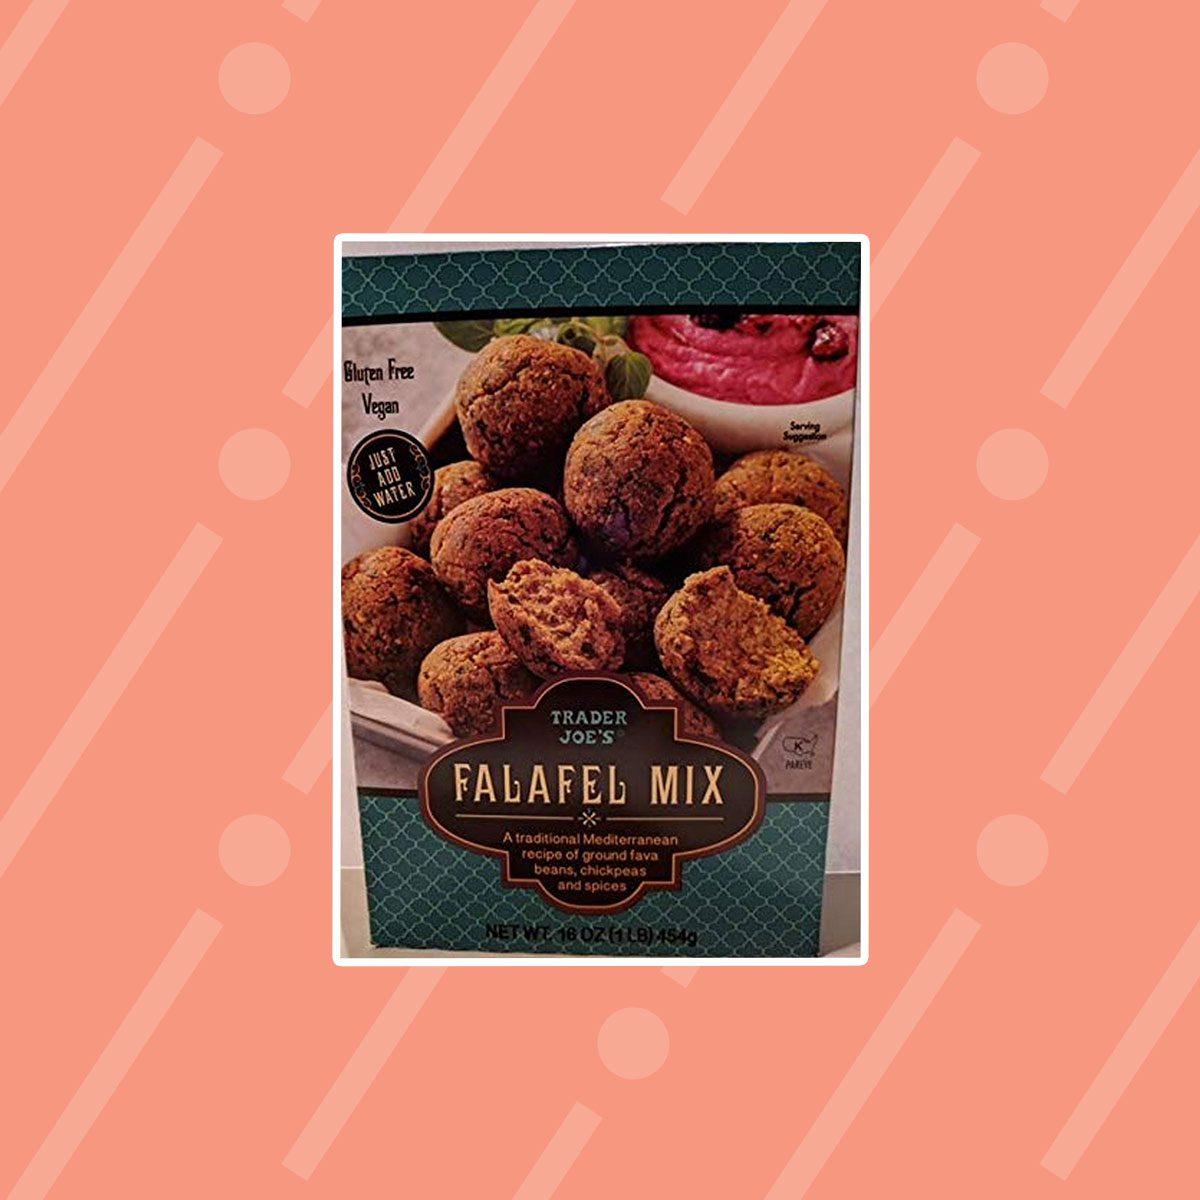 Trader Joe's: Trader Joe's Falafel Mix